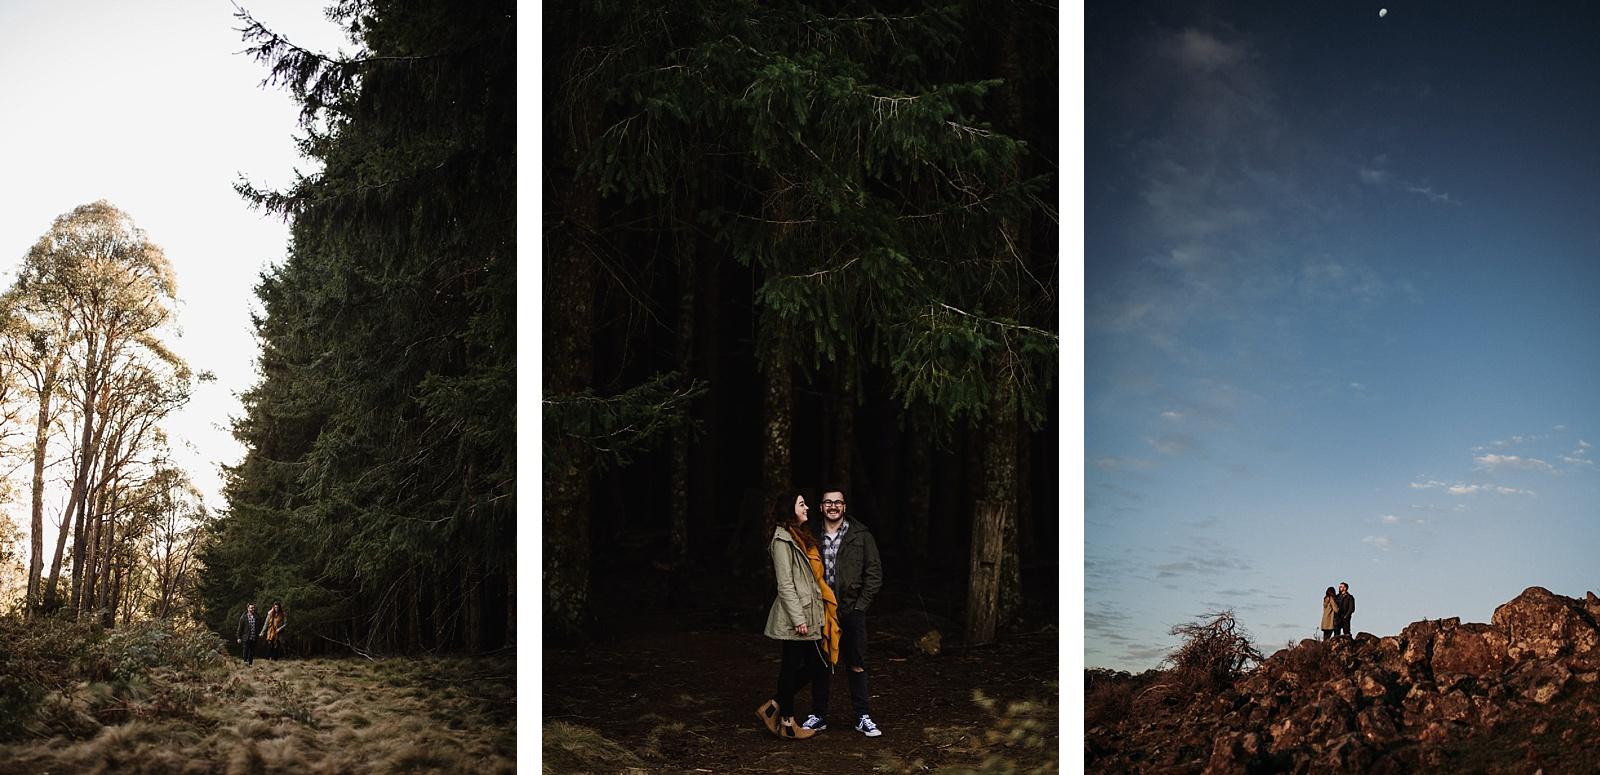 035Barrington Tops Elopement Photographer in Hunter Valley Wedding Photography Newcastle NSW Bryce Noone.jpg